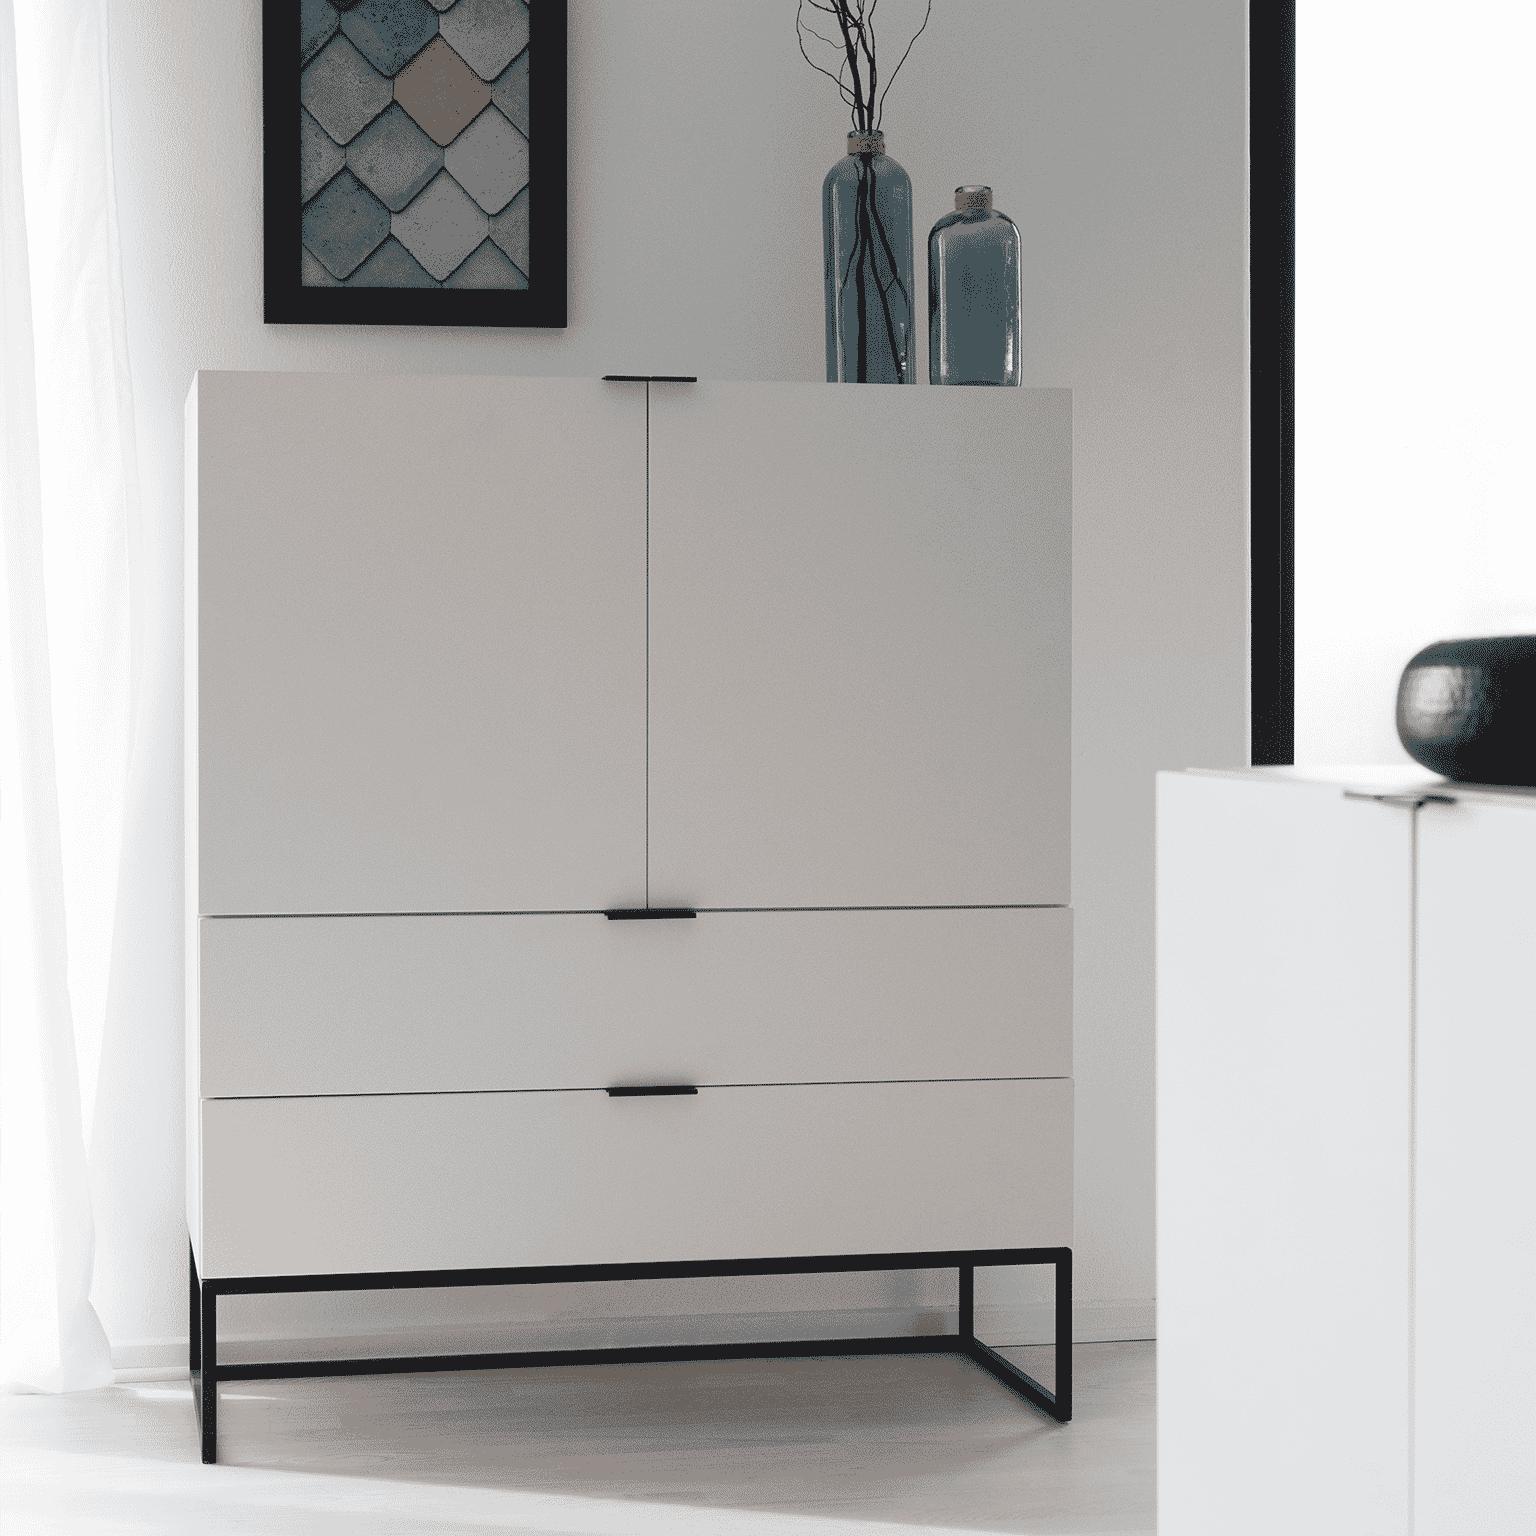 Interstil Opbergkast 'Kobe' 120 x 100cm, kleur wit met voordeel snel in huis via Meubel Partner